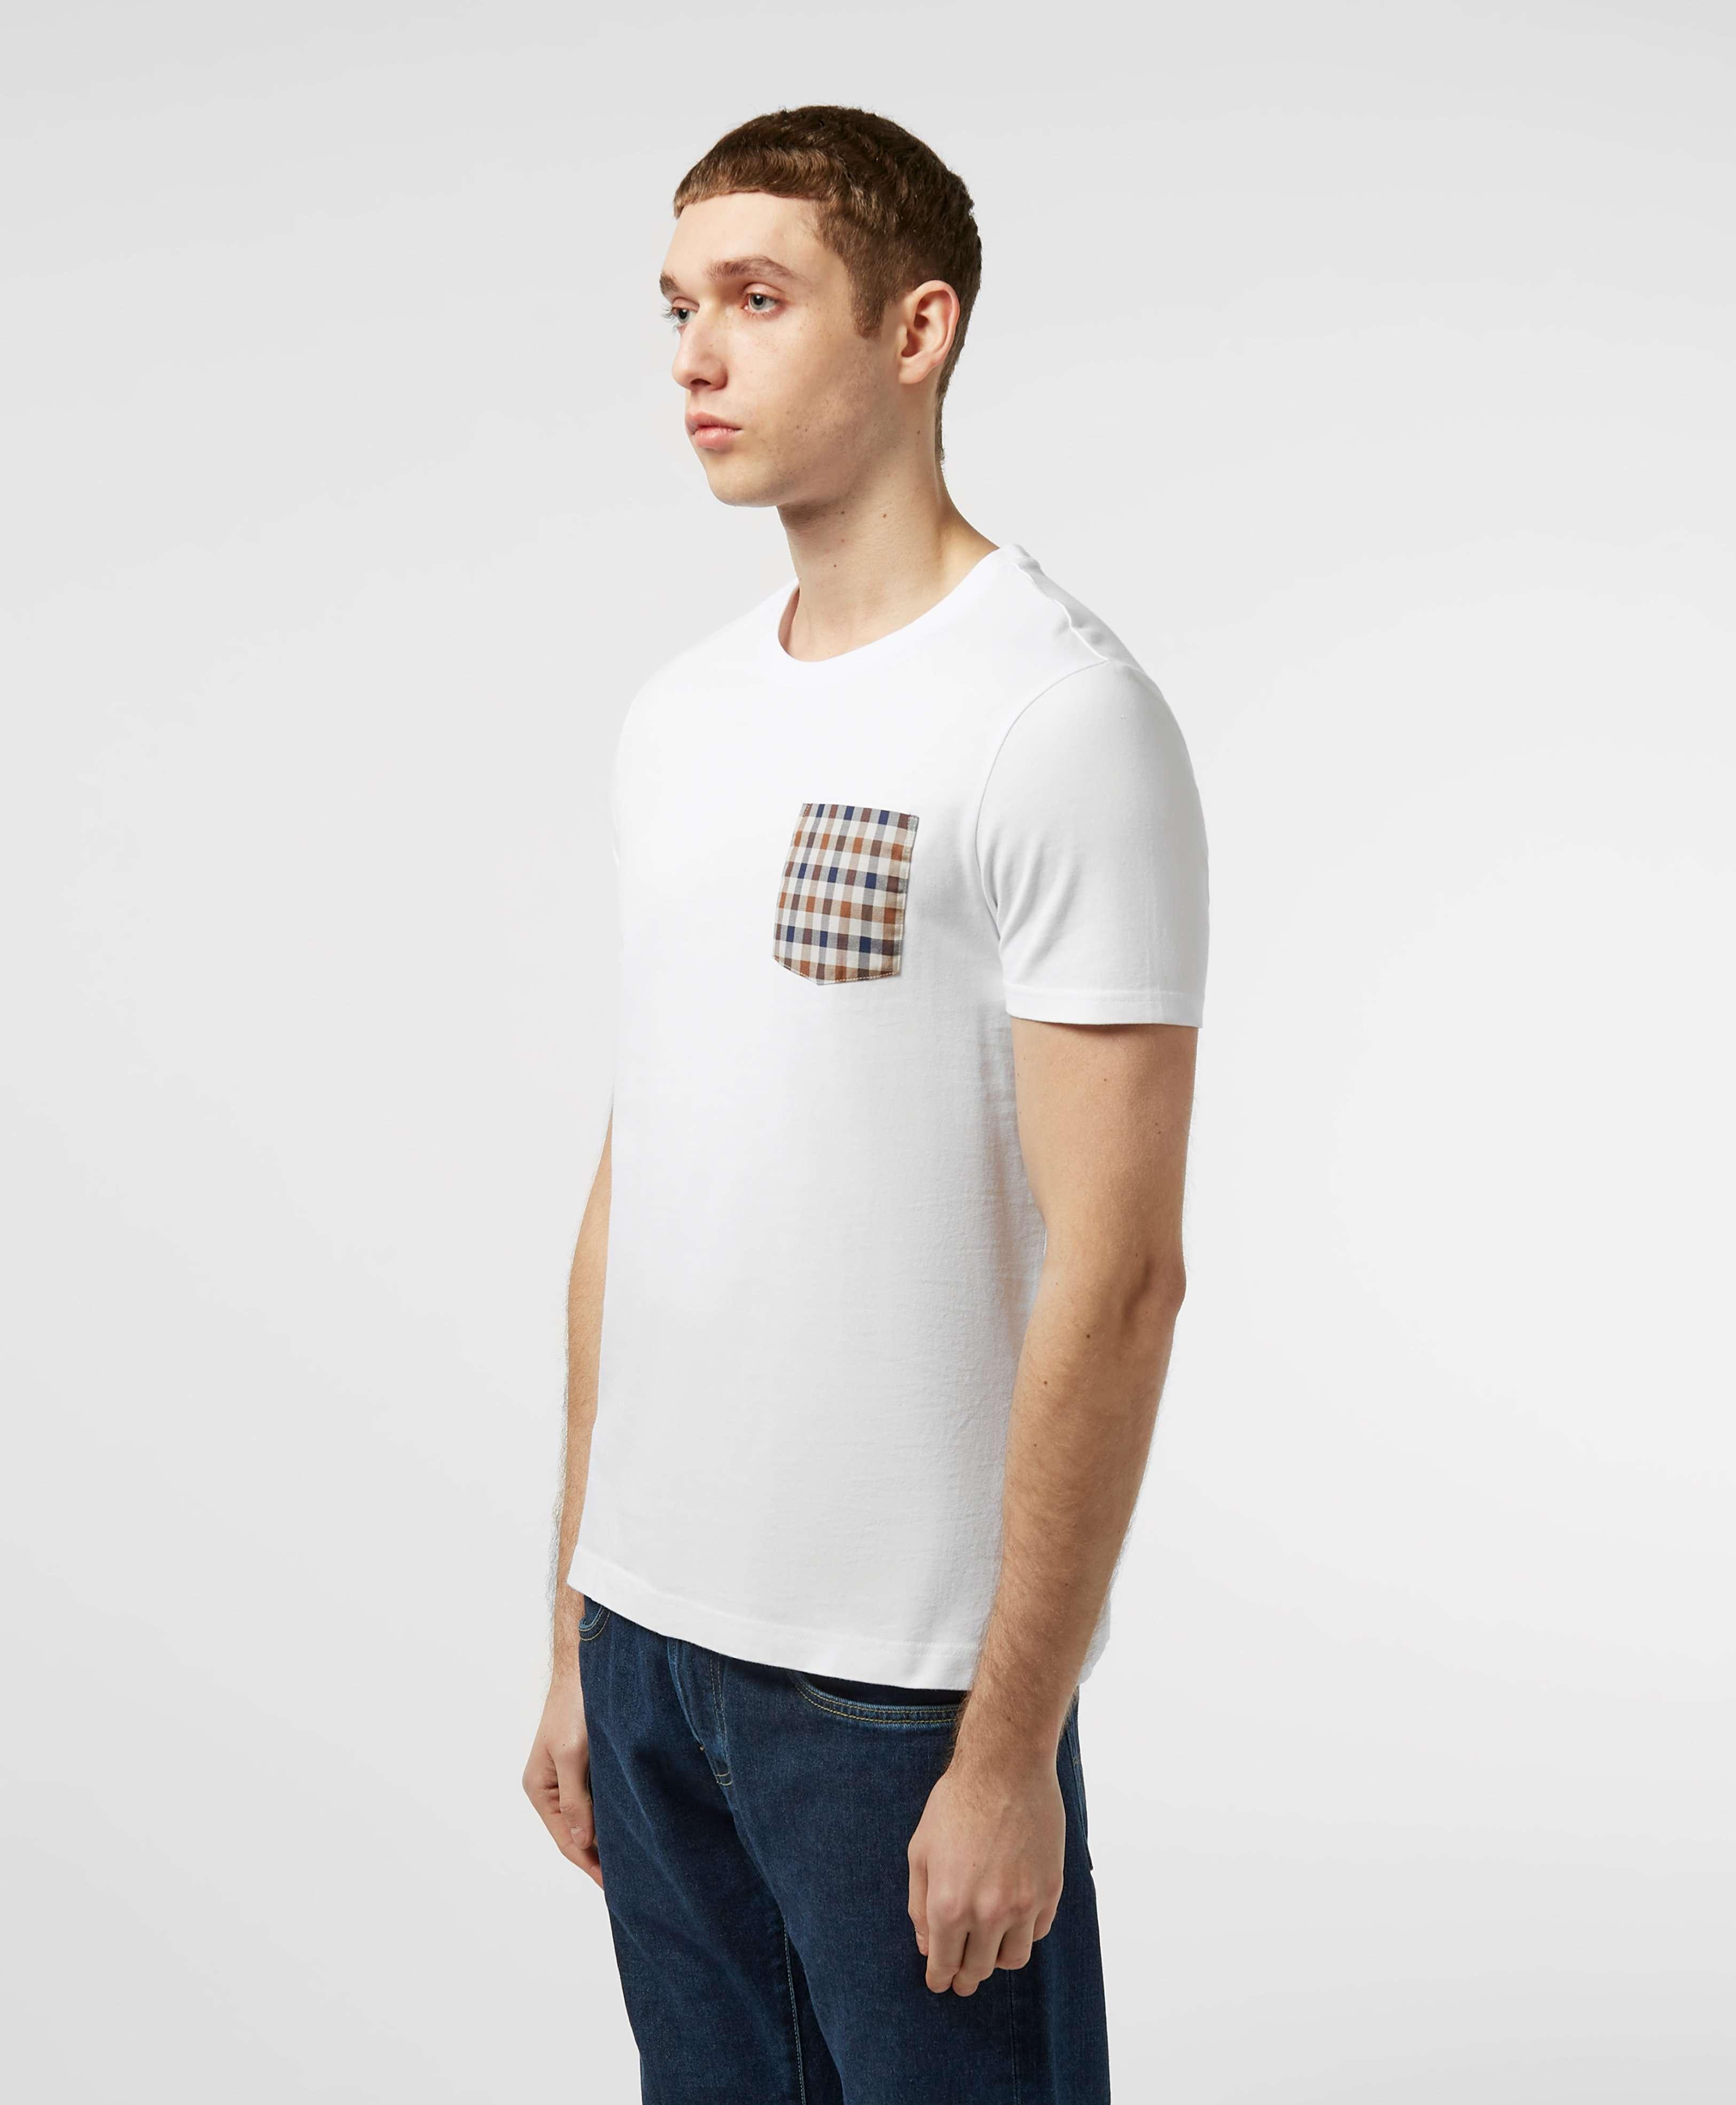 Aquascutum Club Check Pocket Short Sleeve T-Shirt - Exclusive